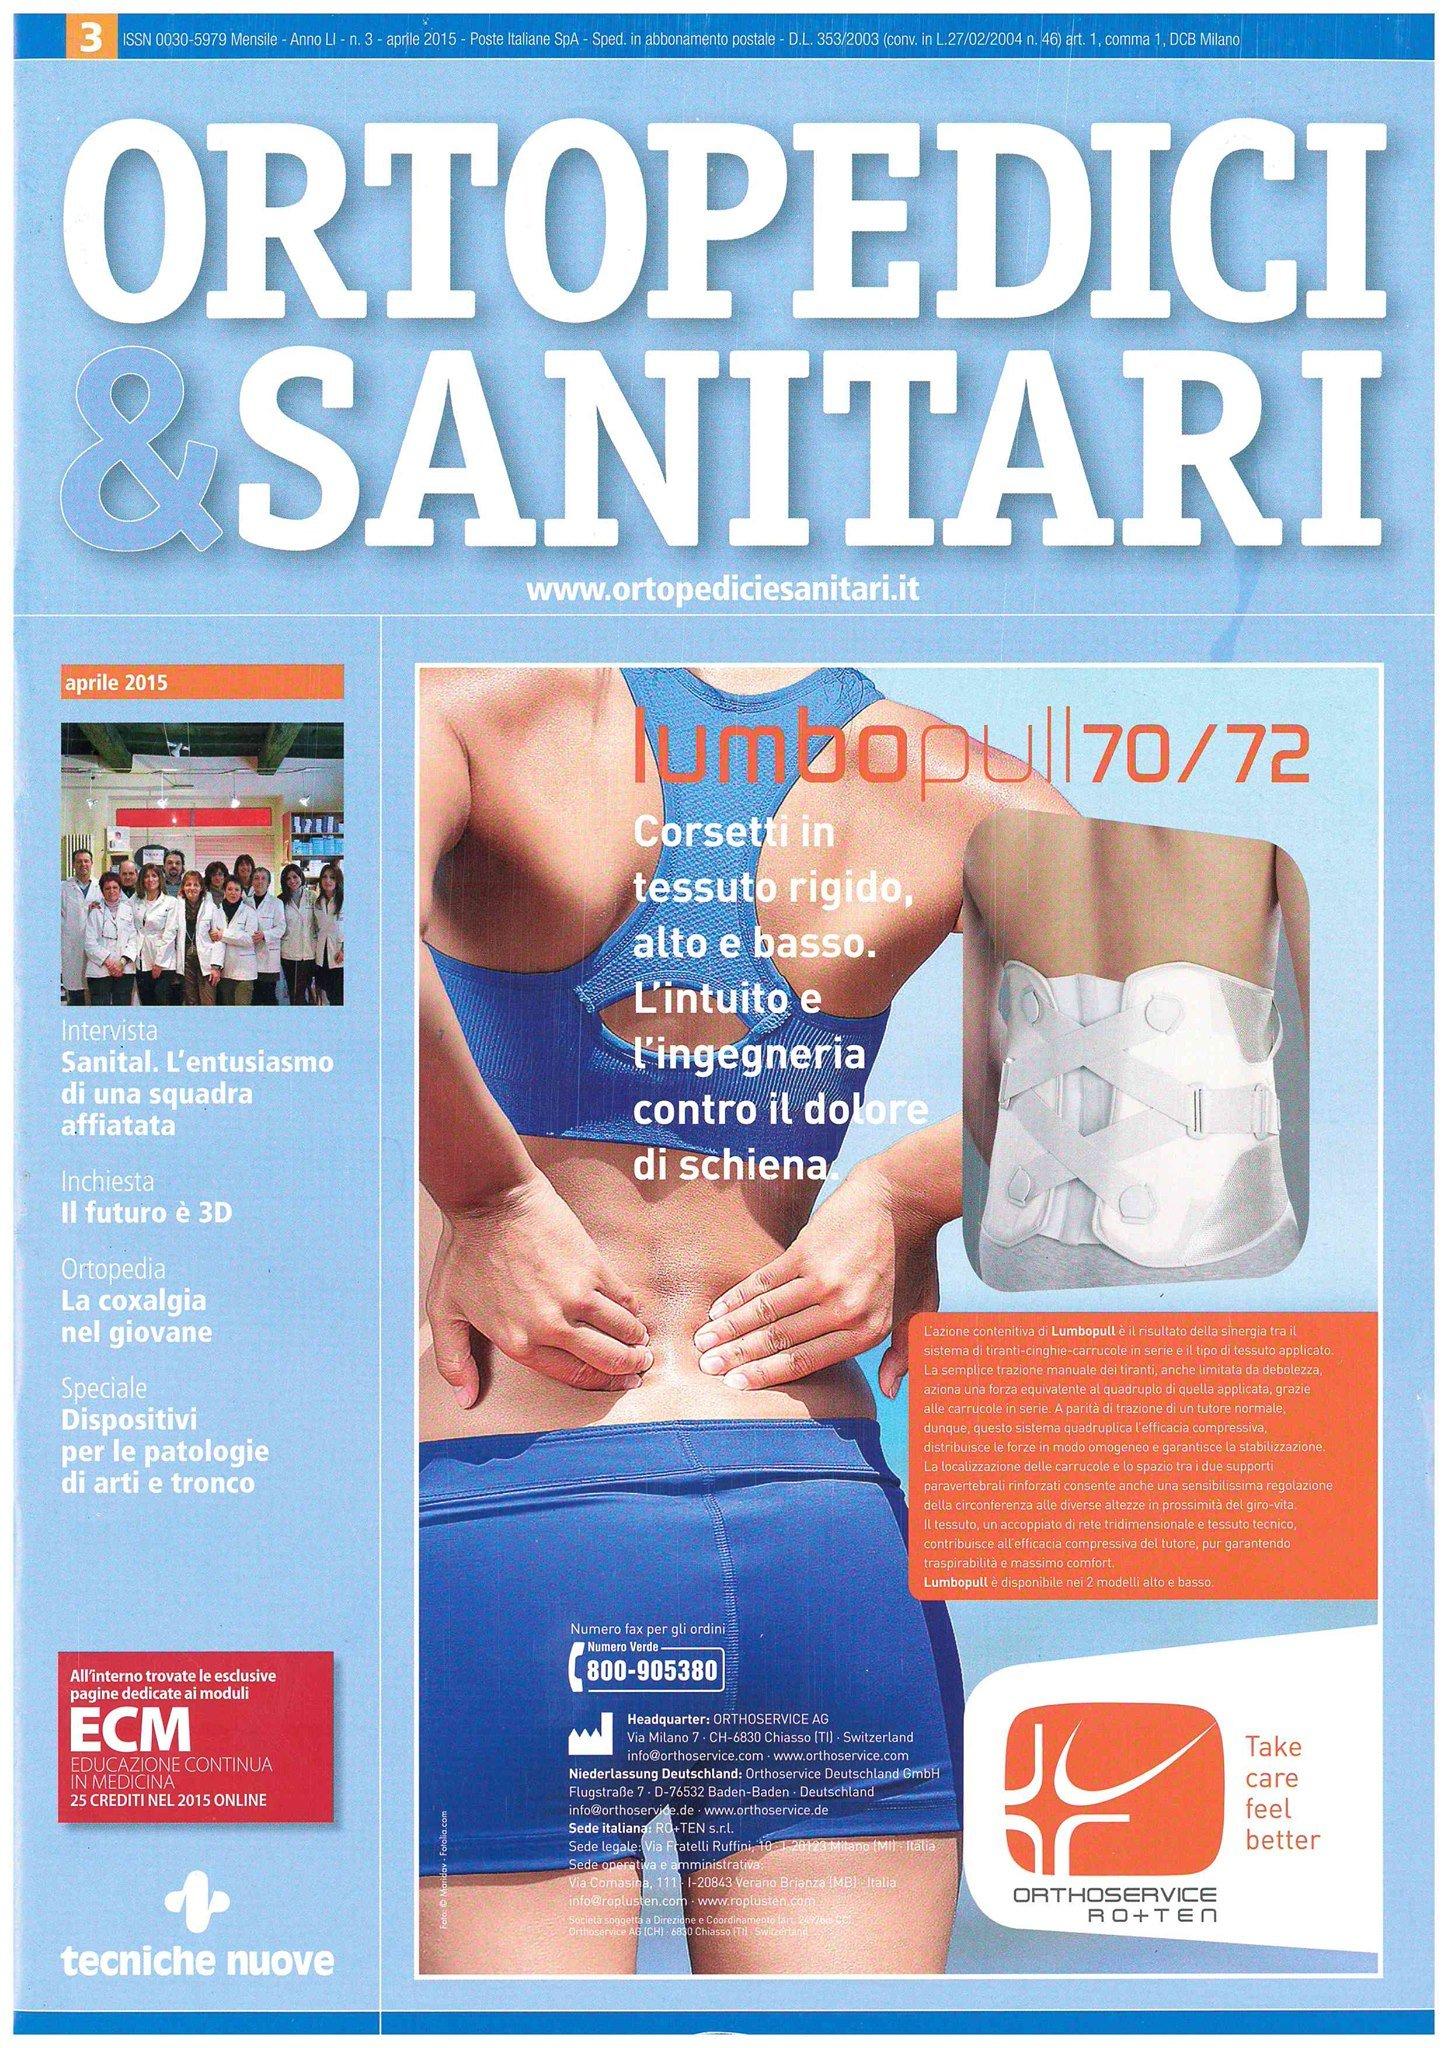 Ortopedici & Sanitari : intervista a Lorenza Flaviani 1